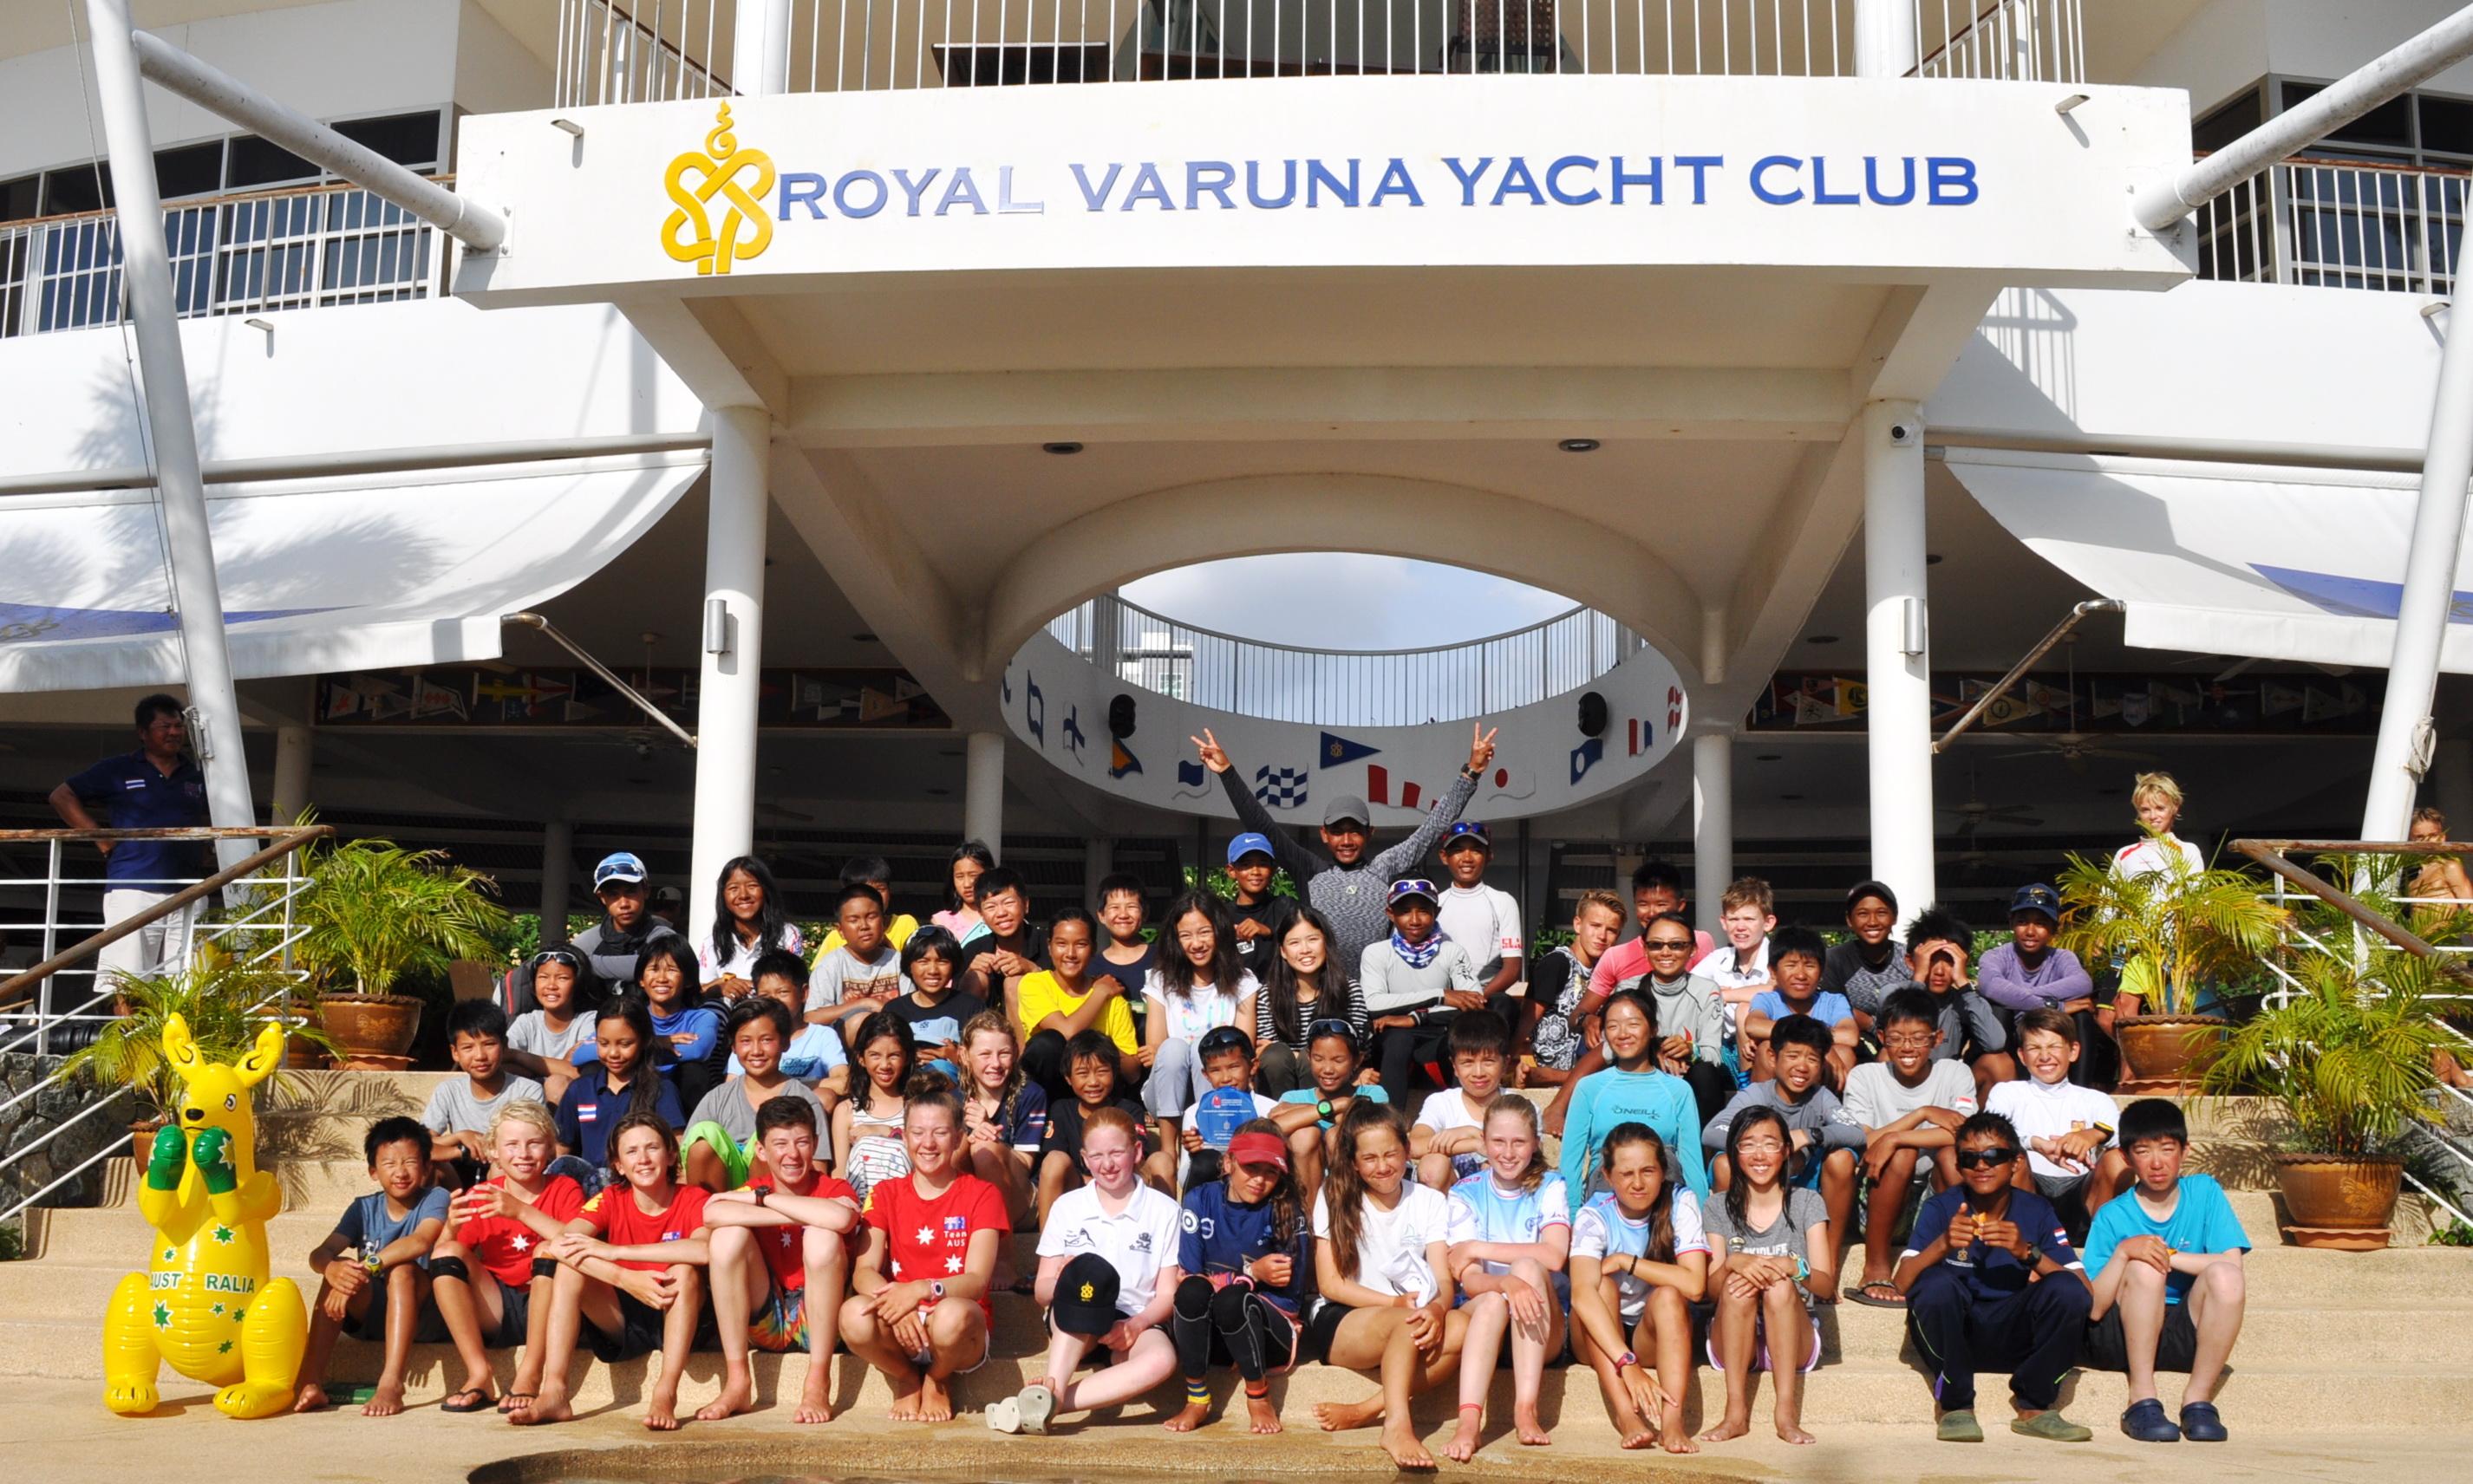 Young Thai and international sailors pose for a group photo at Royal Varuna Yacht Club.